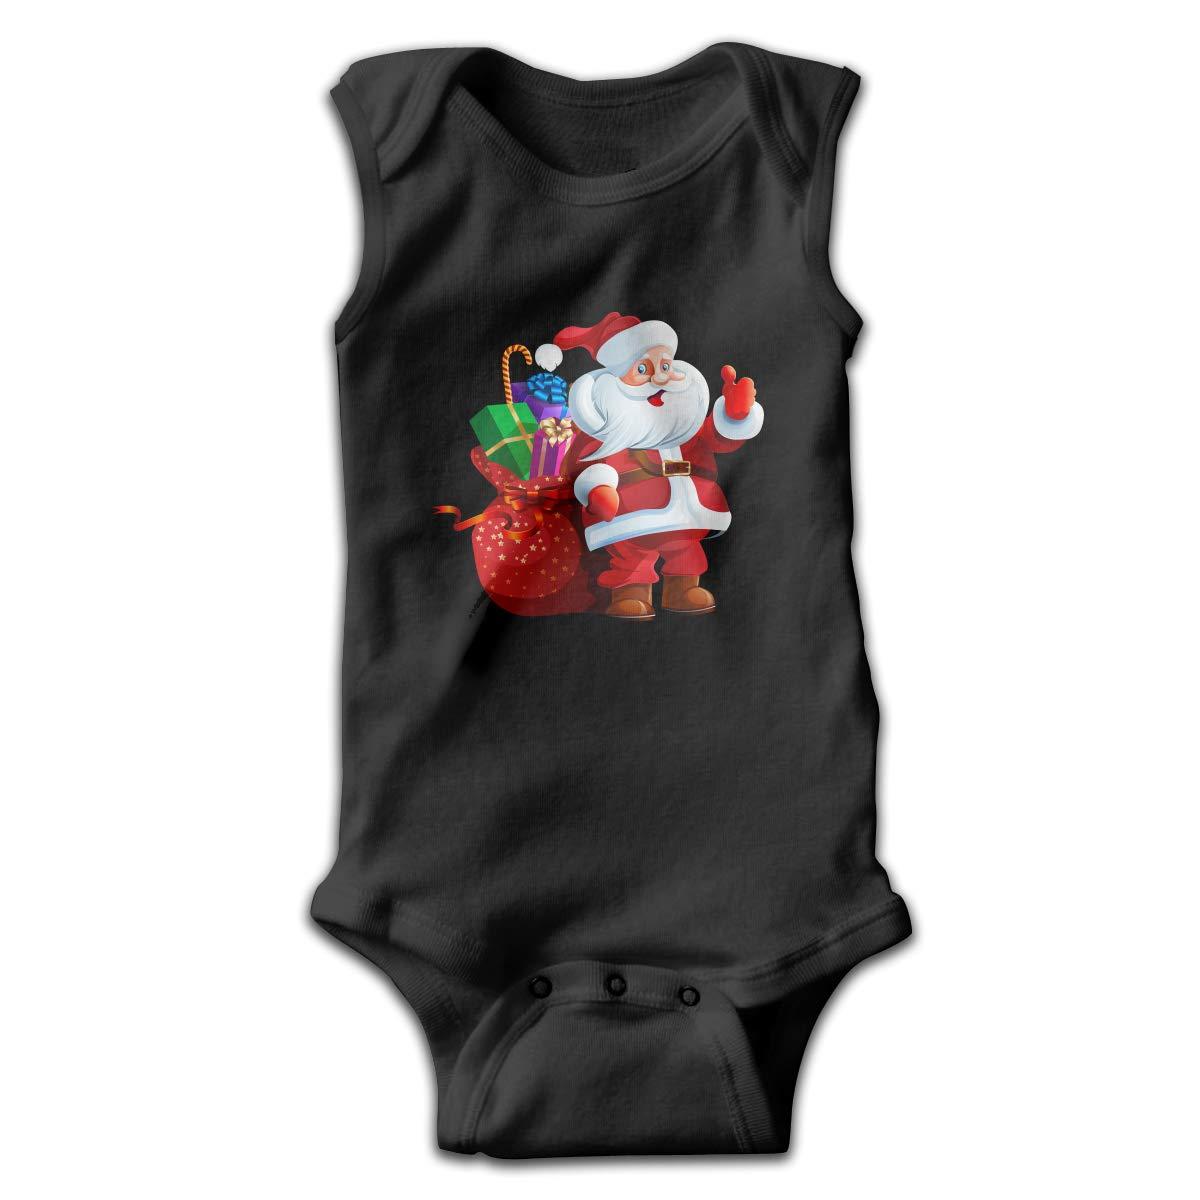 Efbj Newborn Baby Boys Rompers Sleeveless Cotton Onesie,Merry Christmas Bring Gifts Outfit Autumn Pajamas